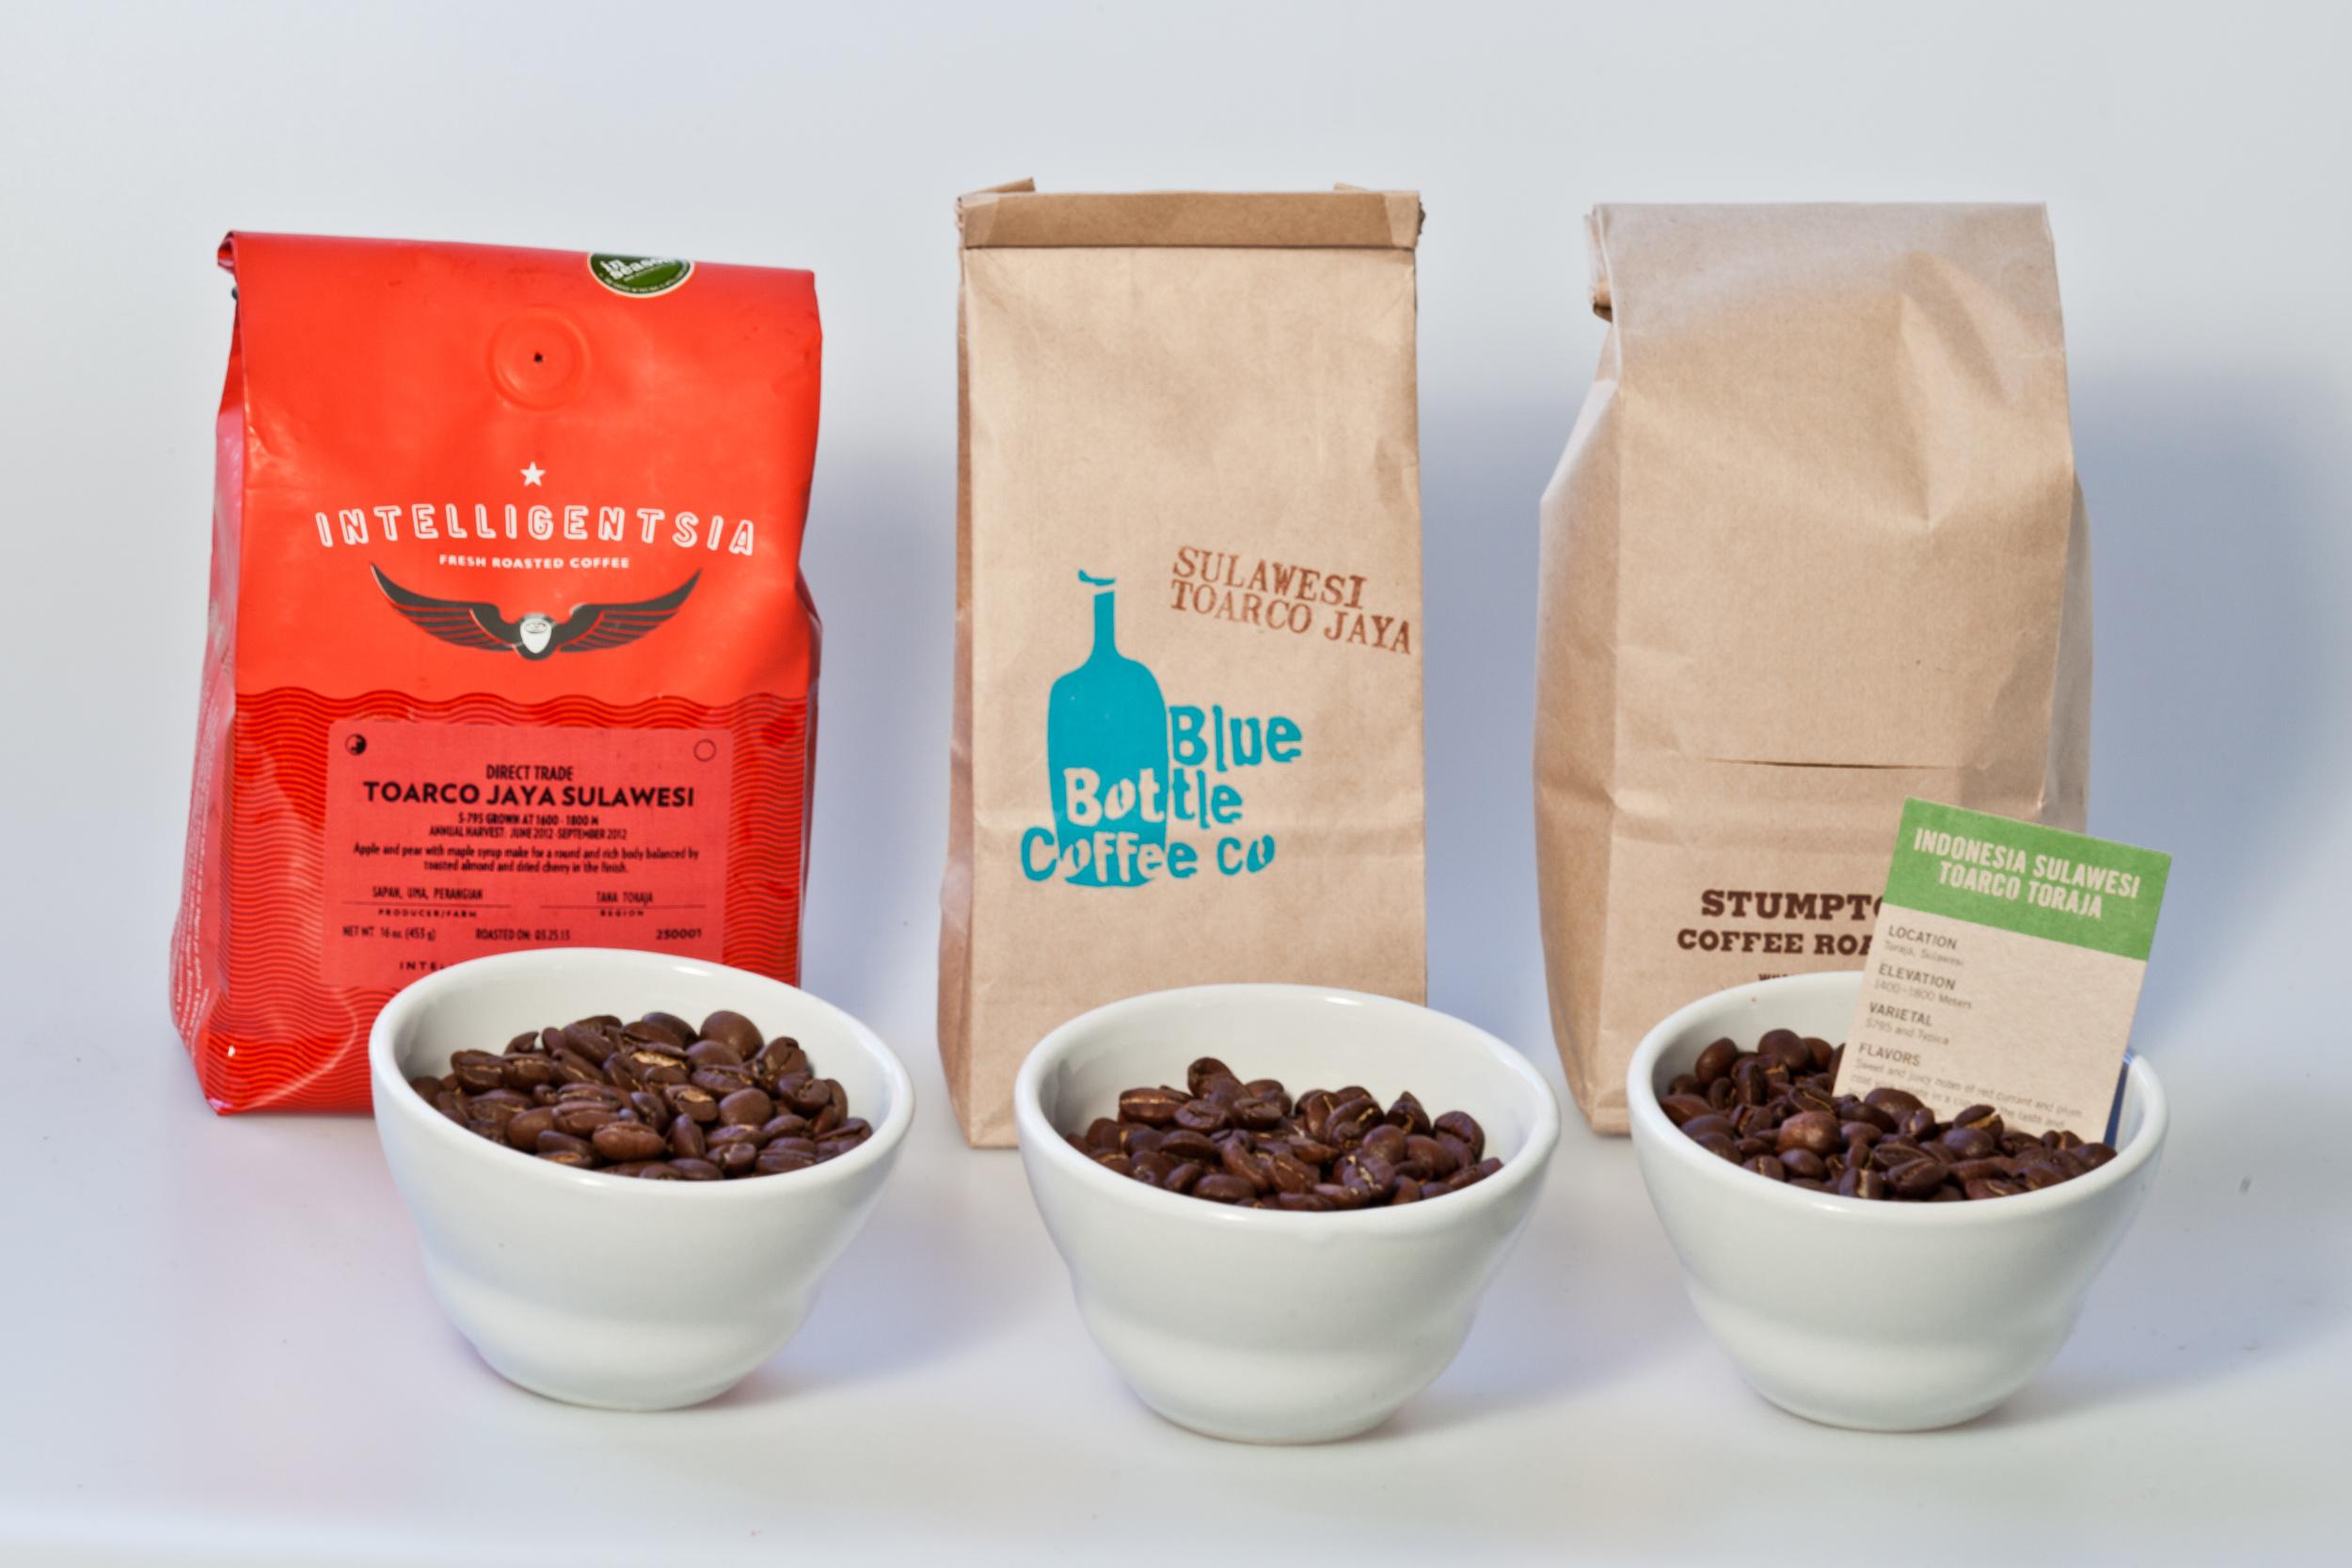 Joyride-Coffee-Distributors-Toarco-Coffee-1-of-4.jpg